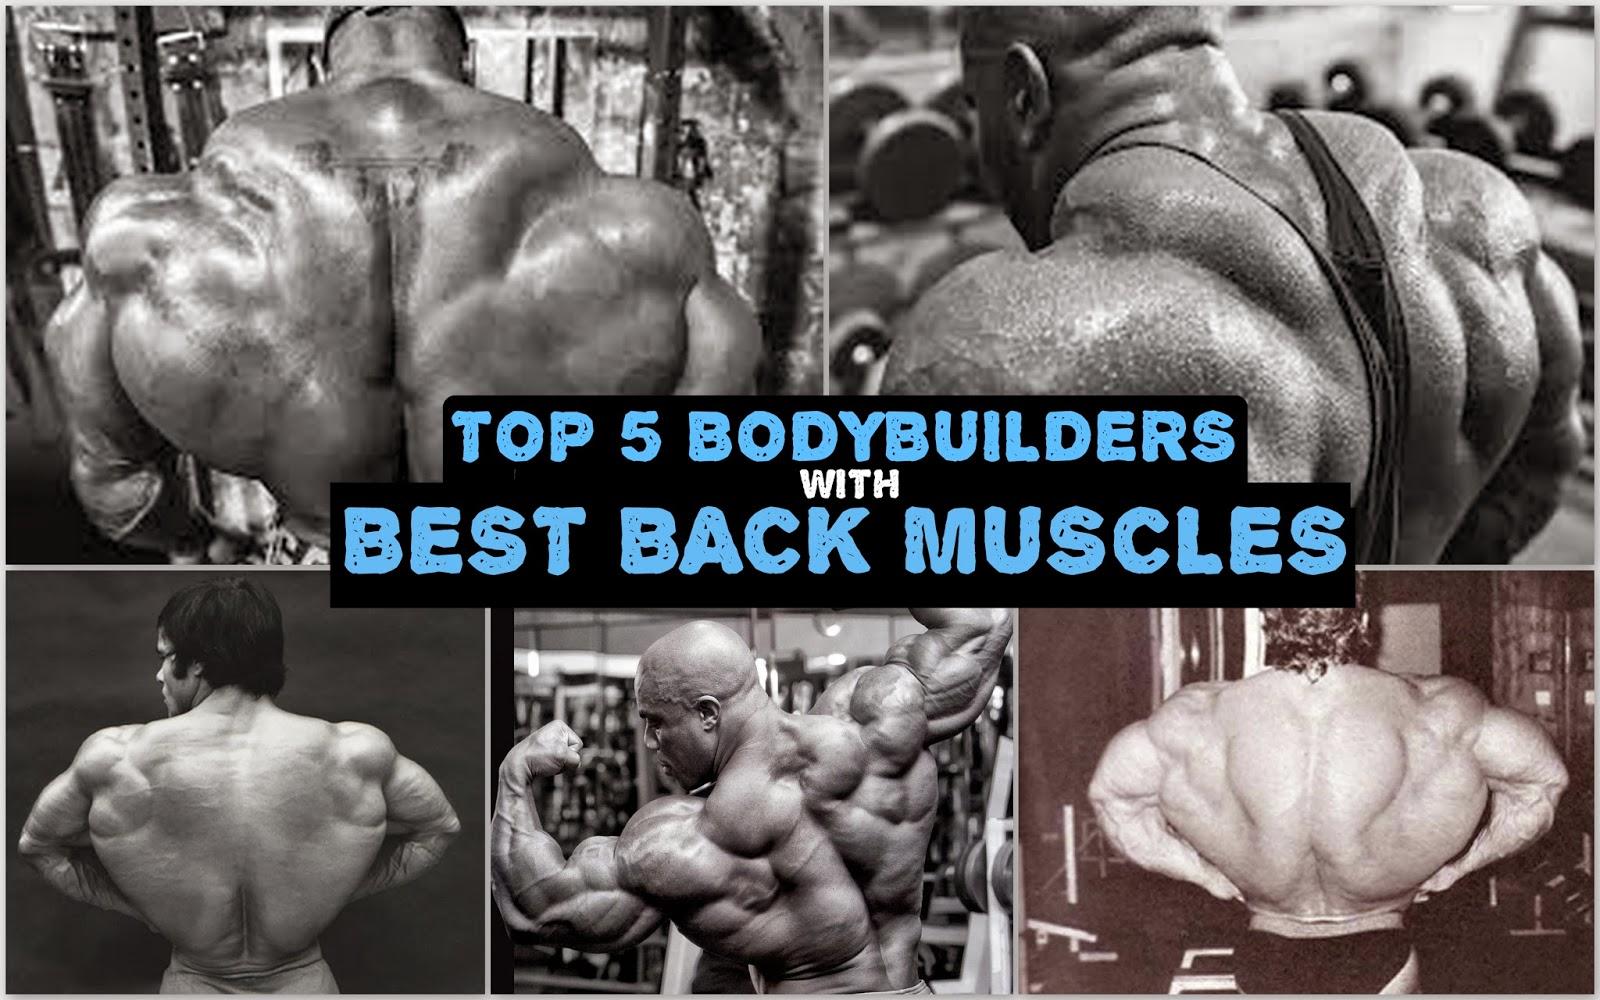 Top 5 Bodybuilders with best back muscles - AESTHETIC BODYBUILDING